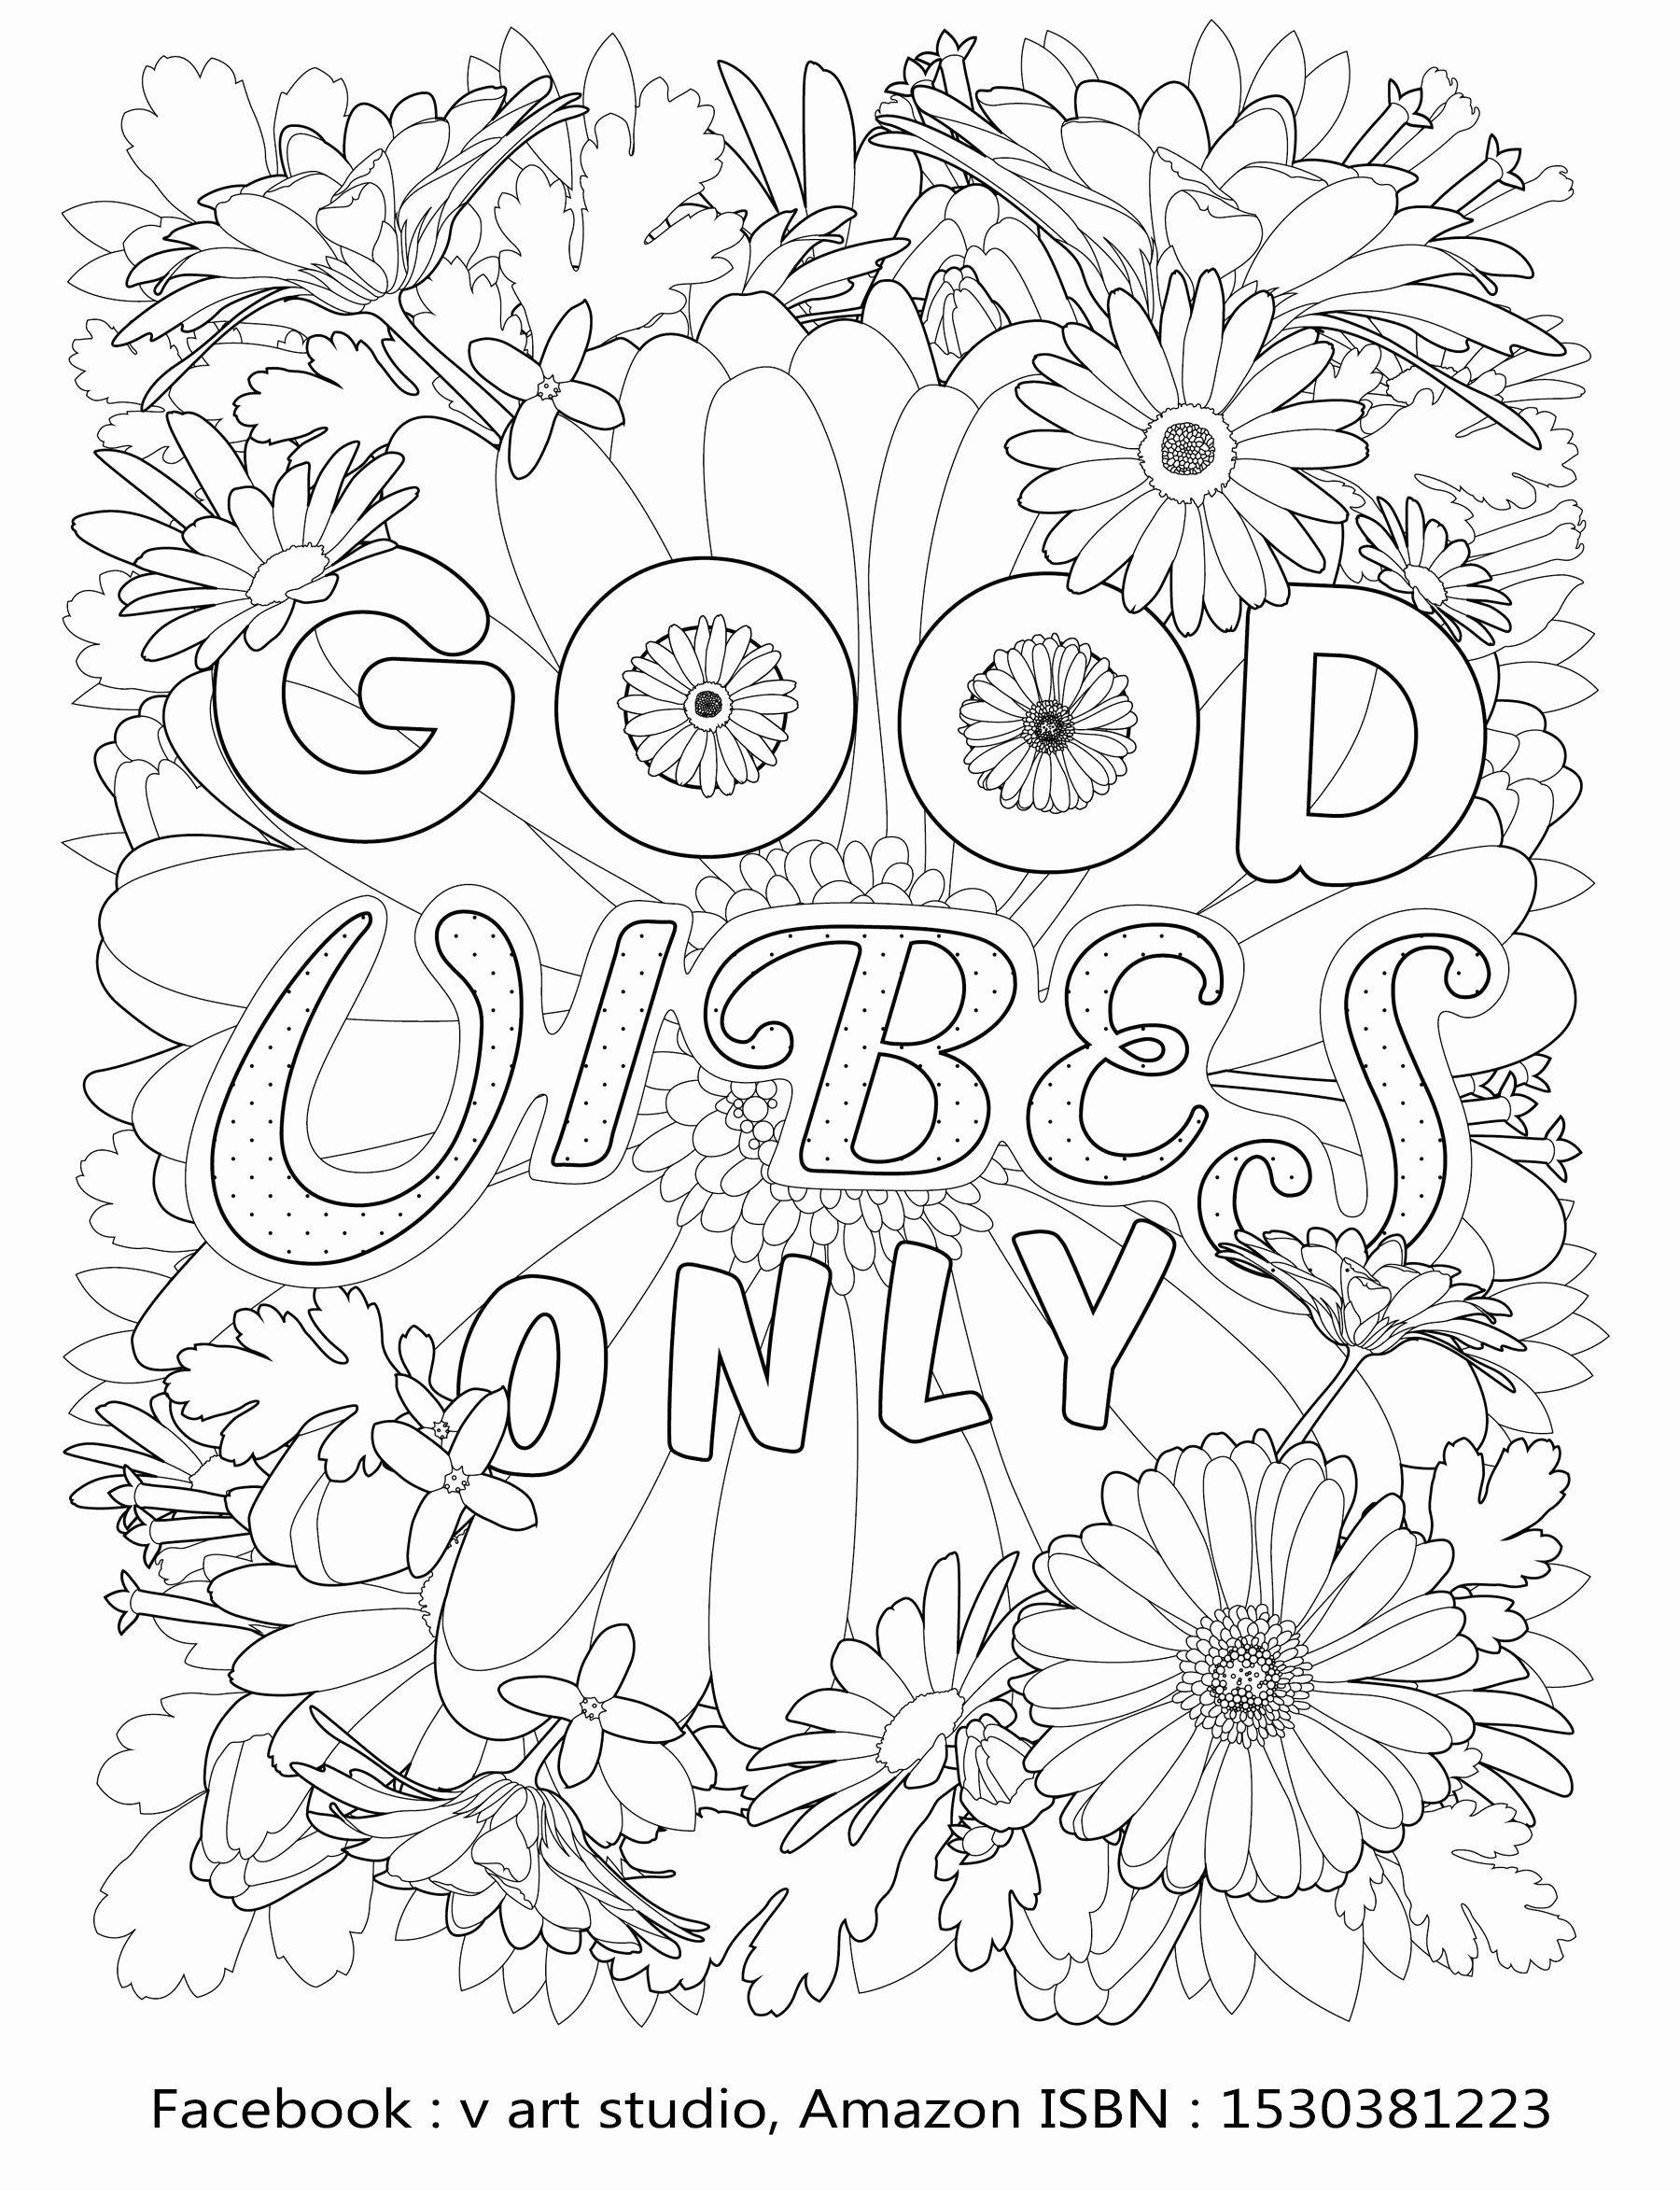 Coloring Book Sheets